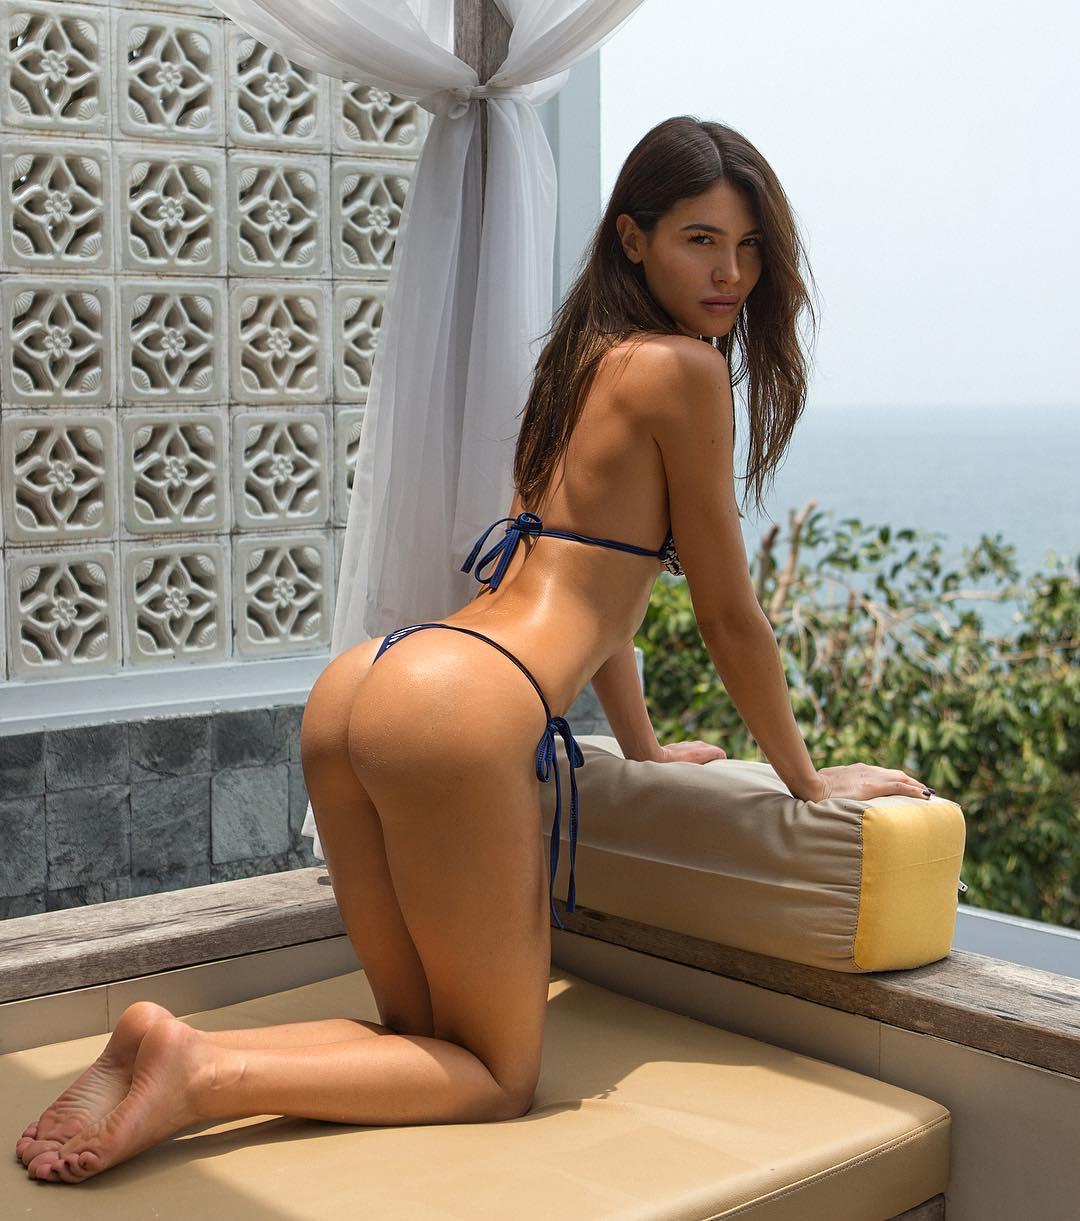 Selfie Silvia Caruso nude (71 photo), Sexy, Cleavage, Instagram, legs 2017